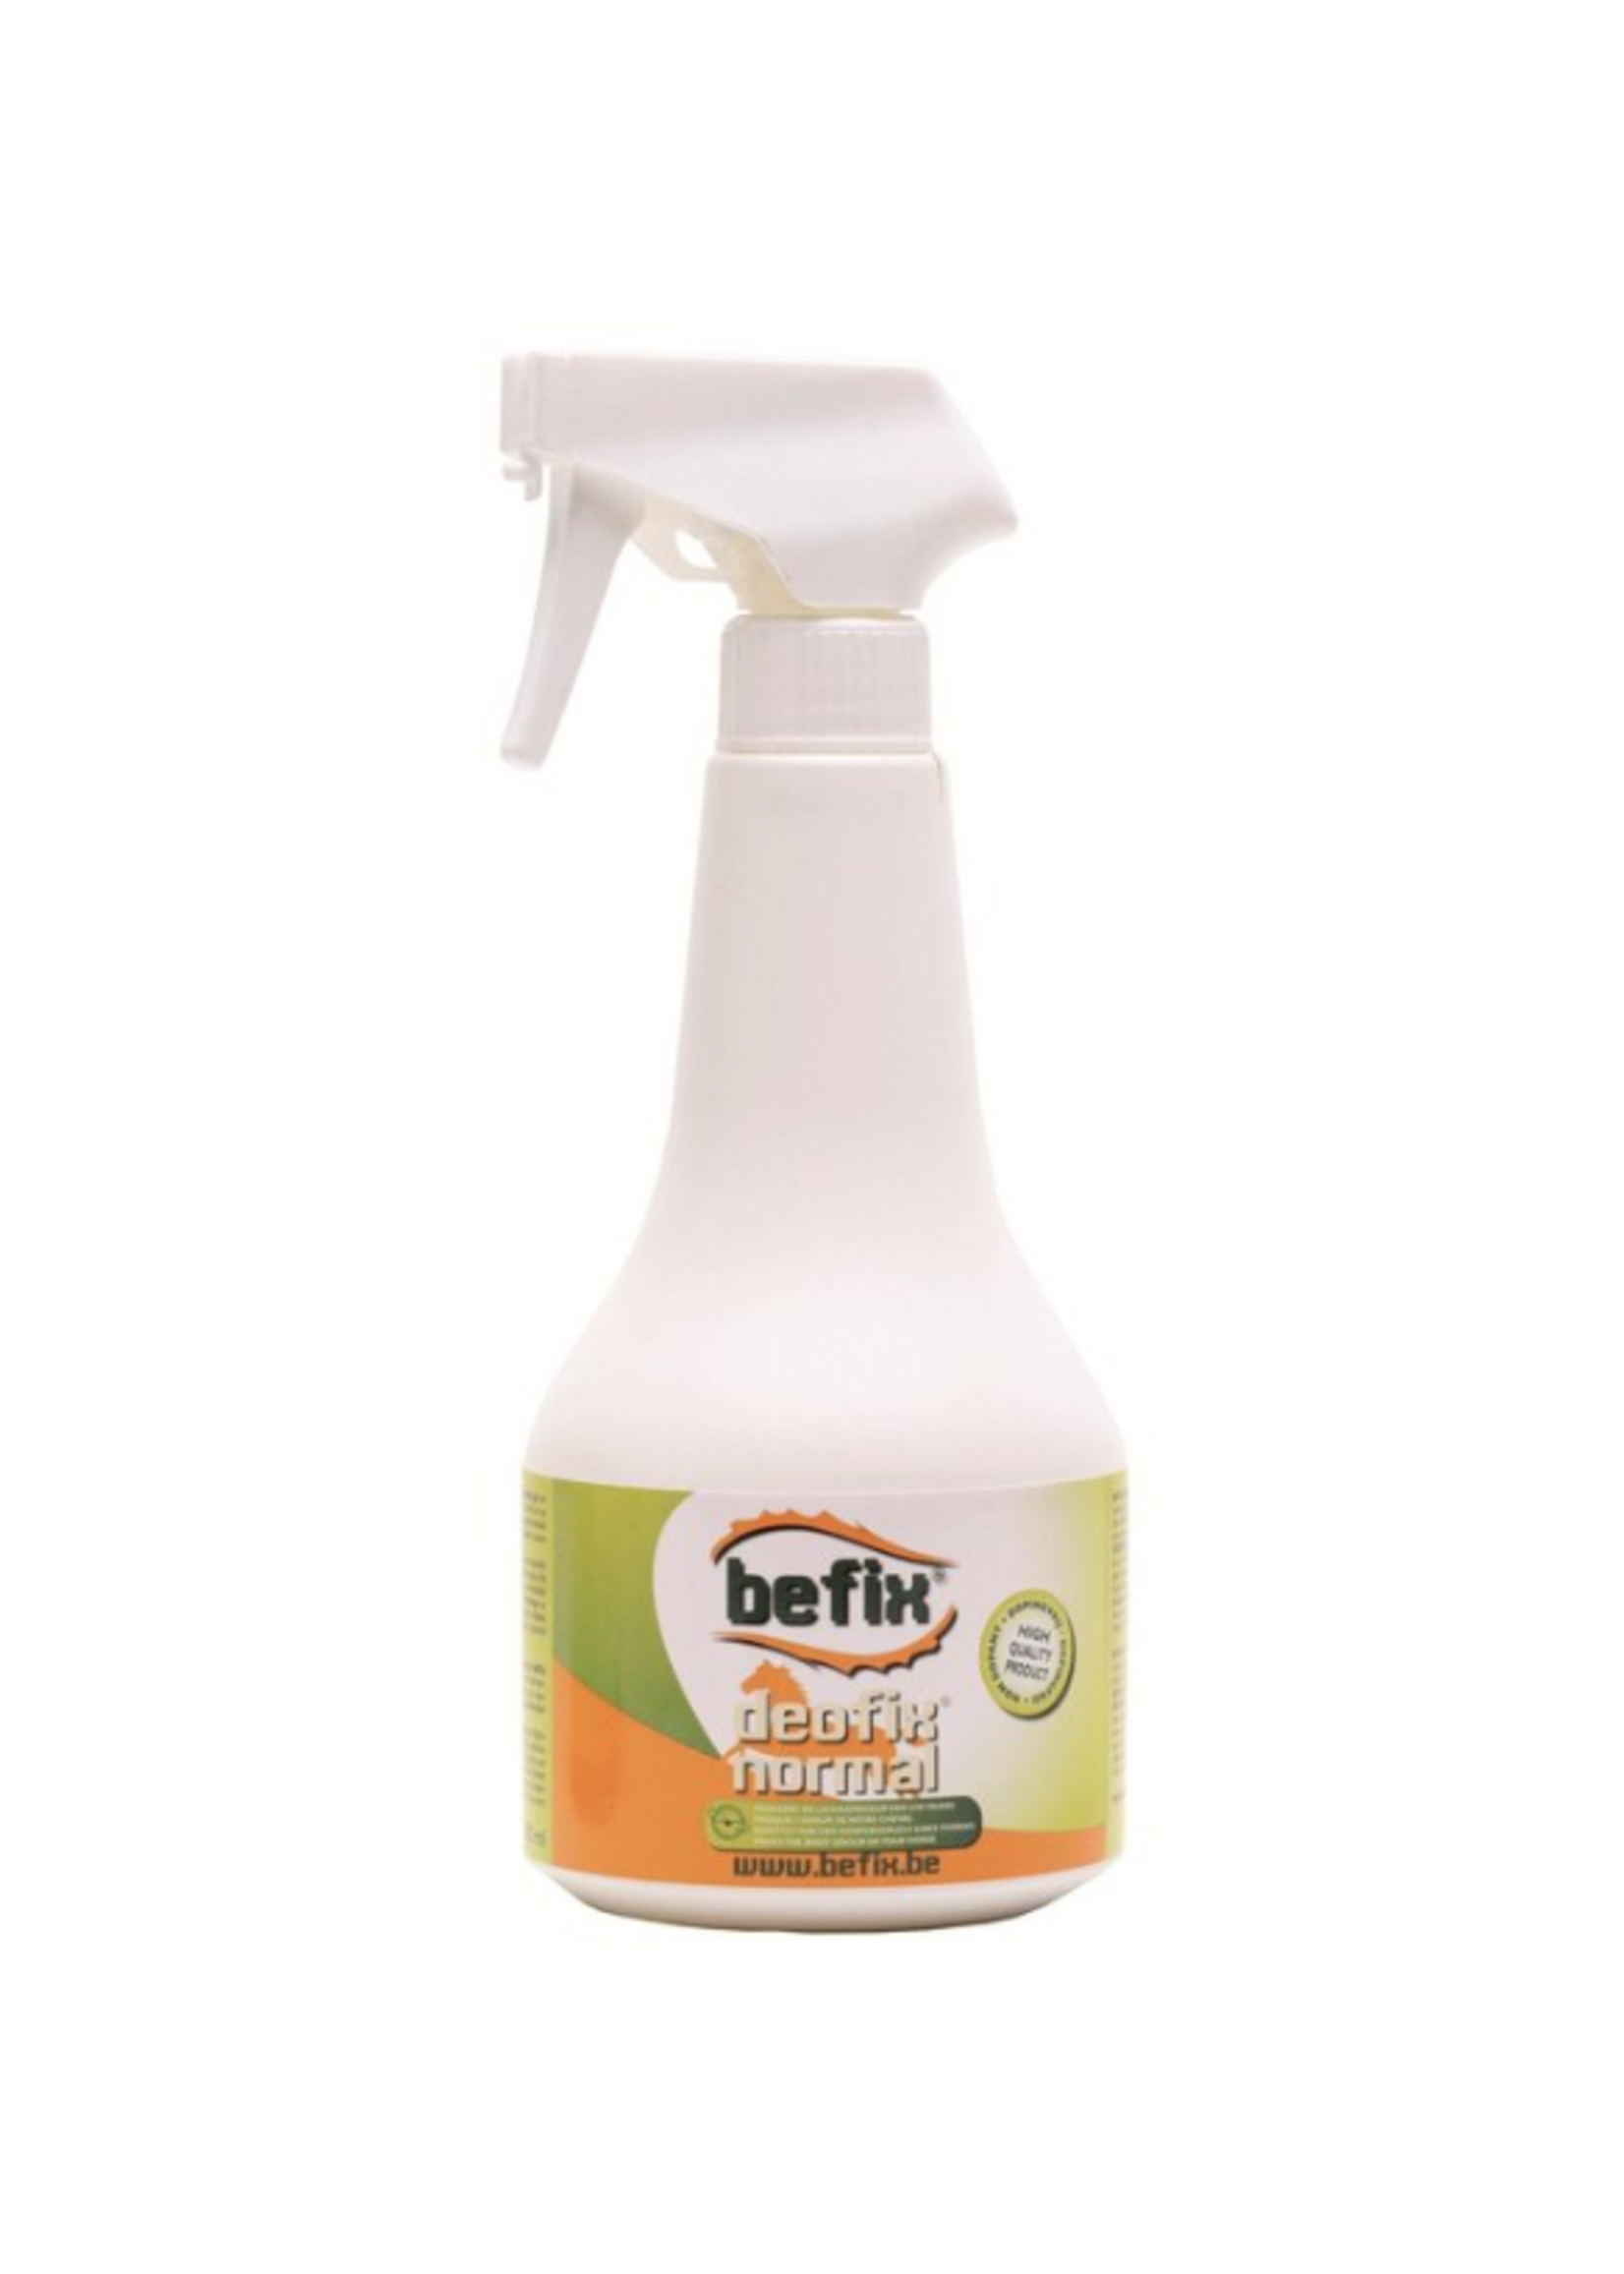 Befix Befix Deofix Normal Spray